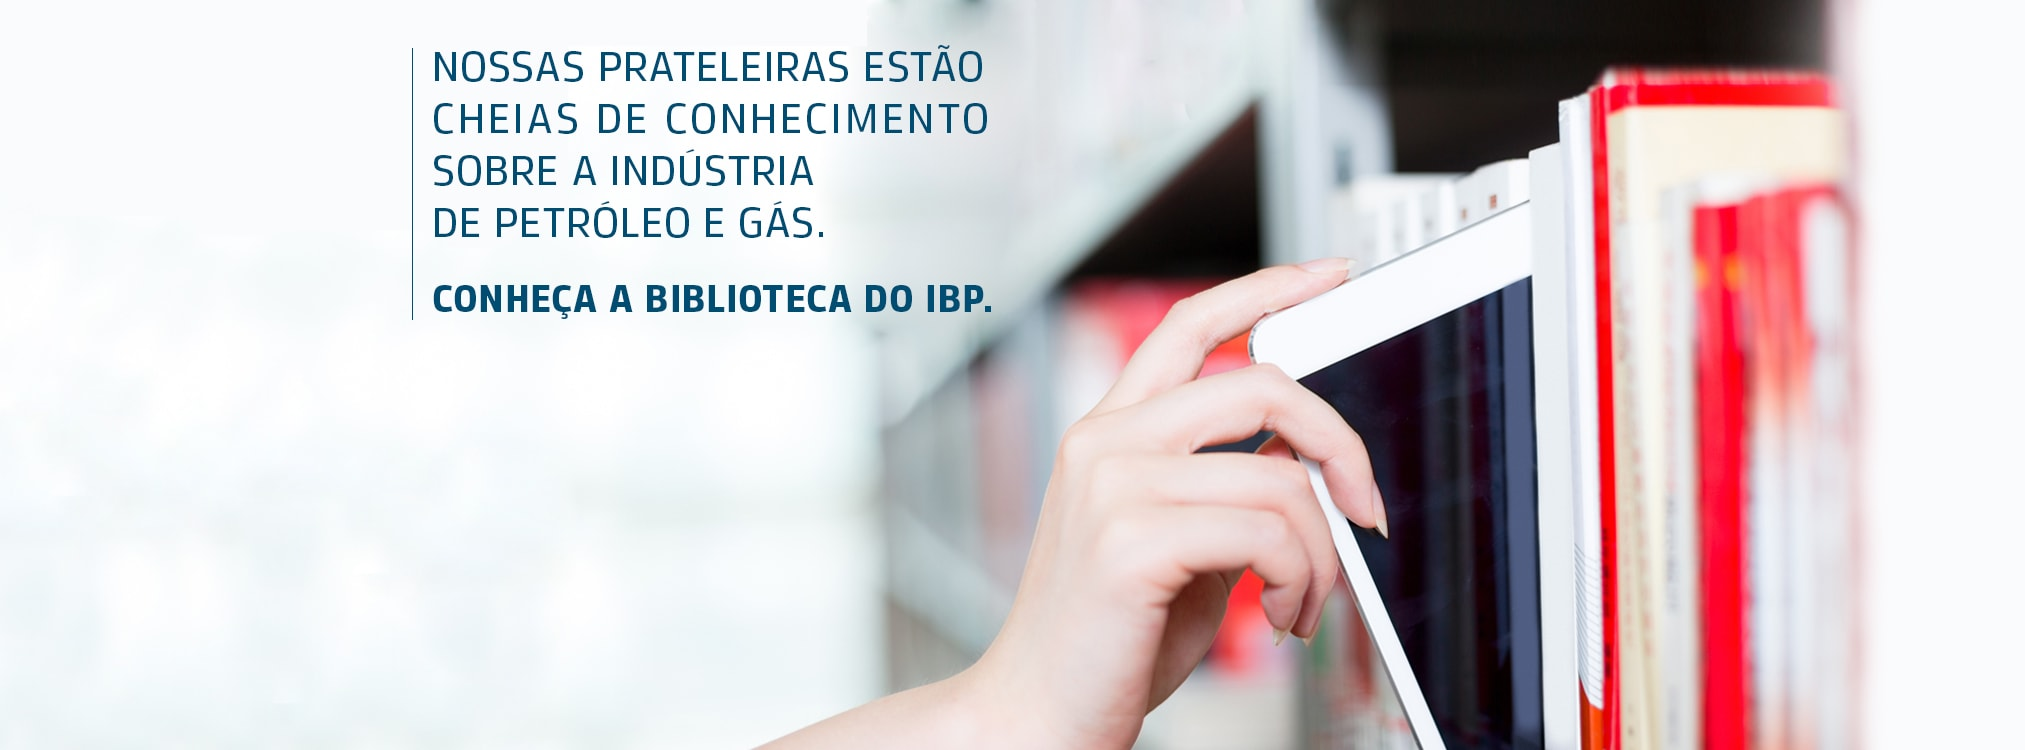 IBP_Job51_Home_Biblioteca_2025x750px-min